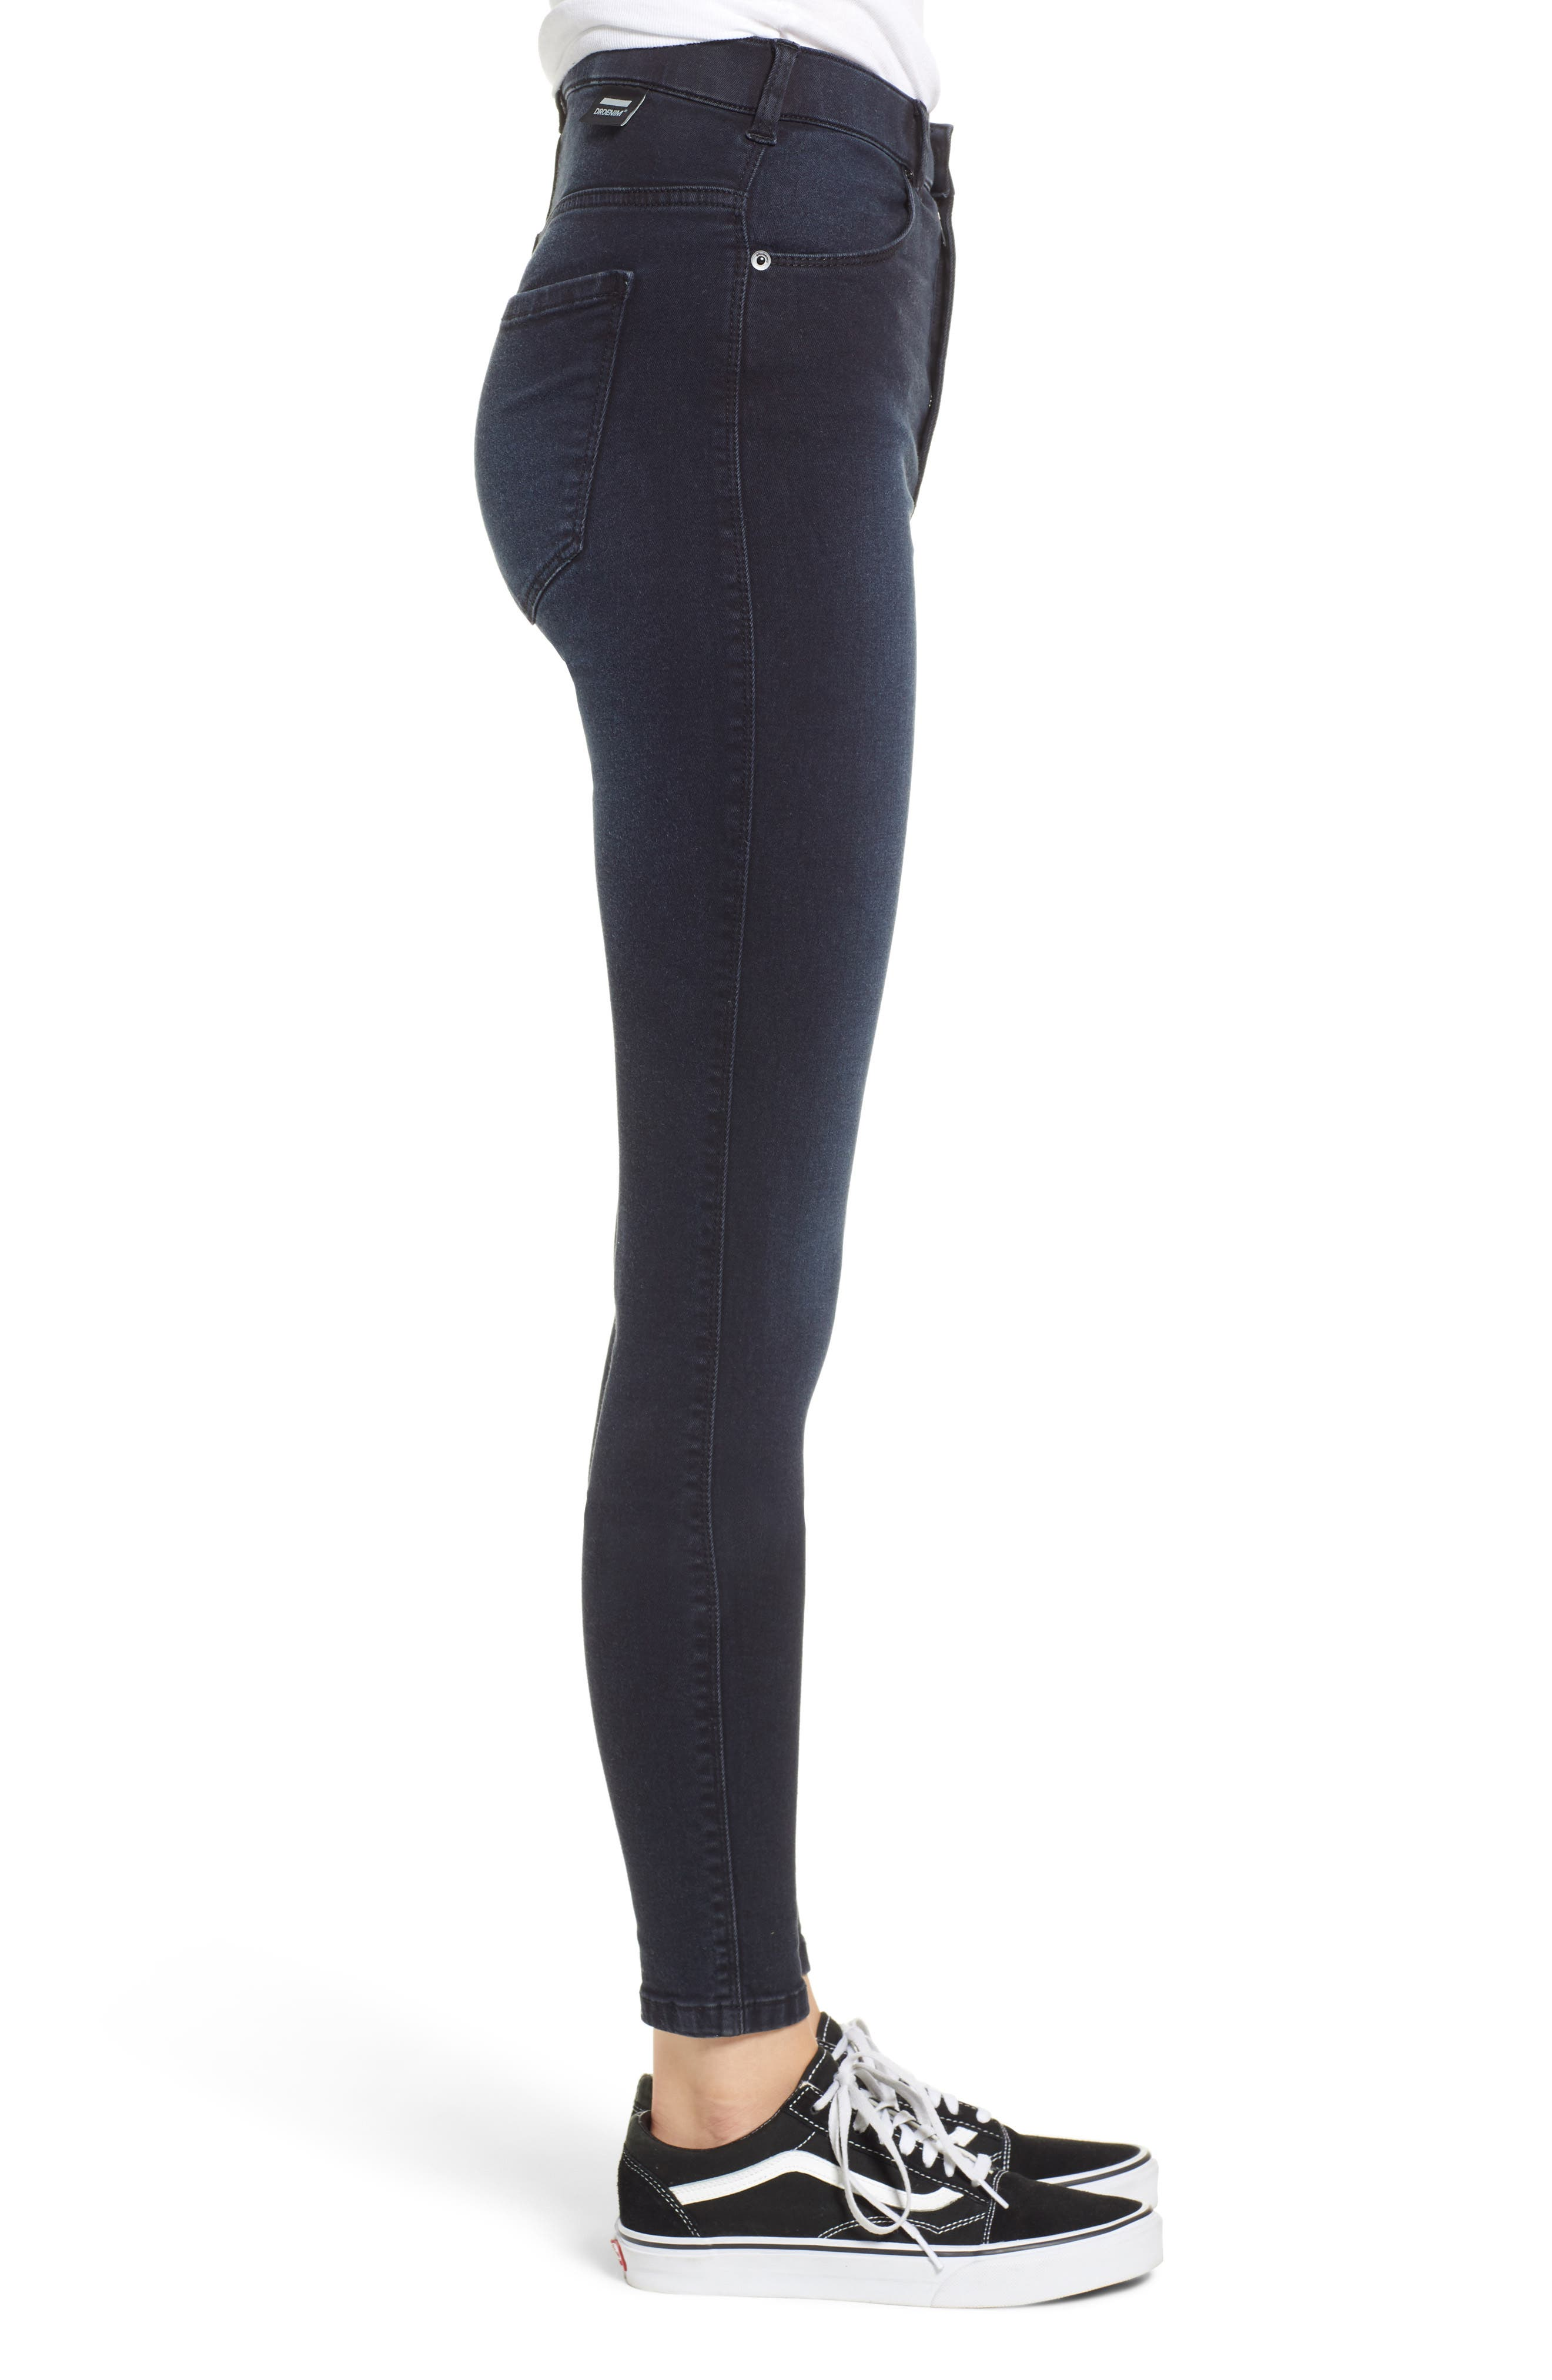 Moxy Skinny Jeans,                             Alternate thumbnail 3, color,                             PITCH DARK BLUE